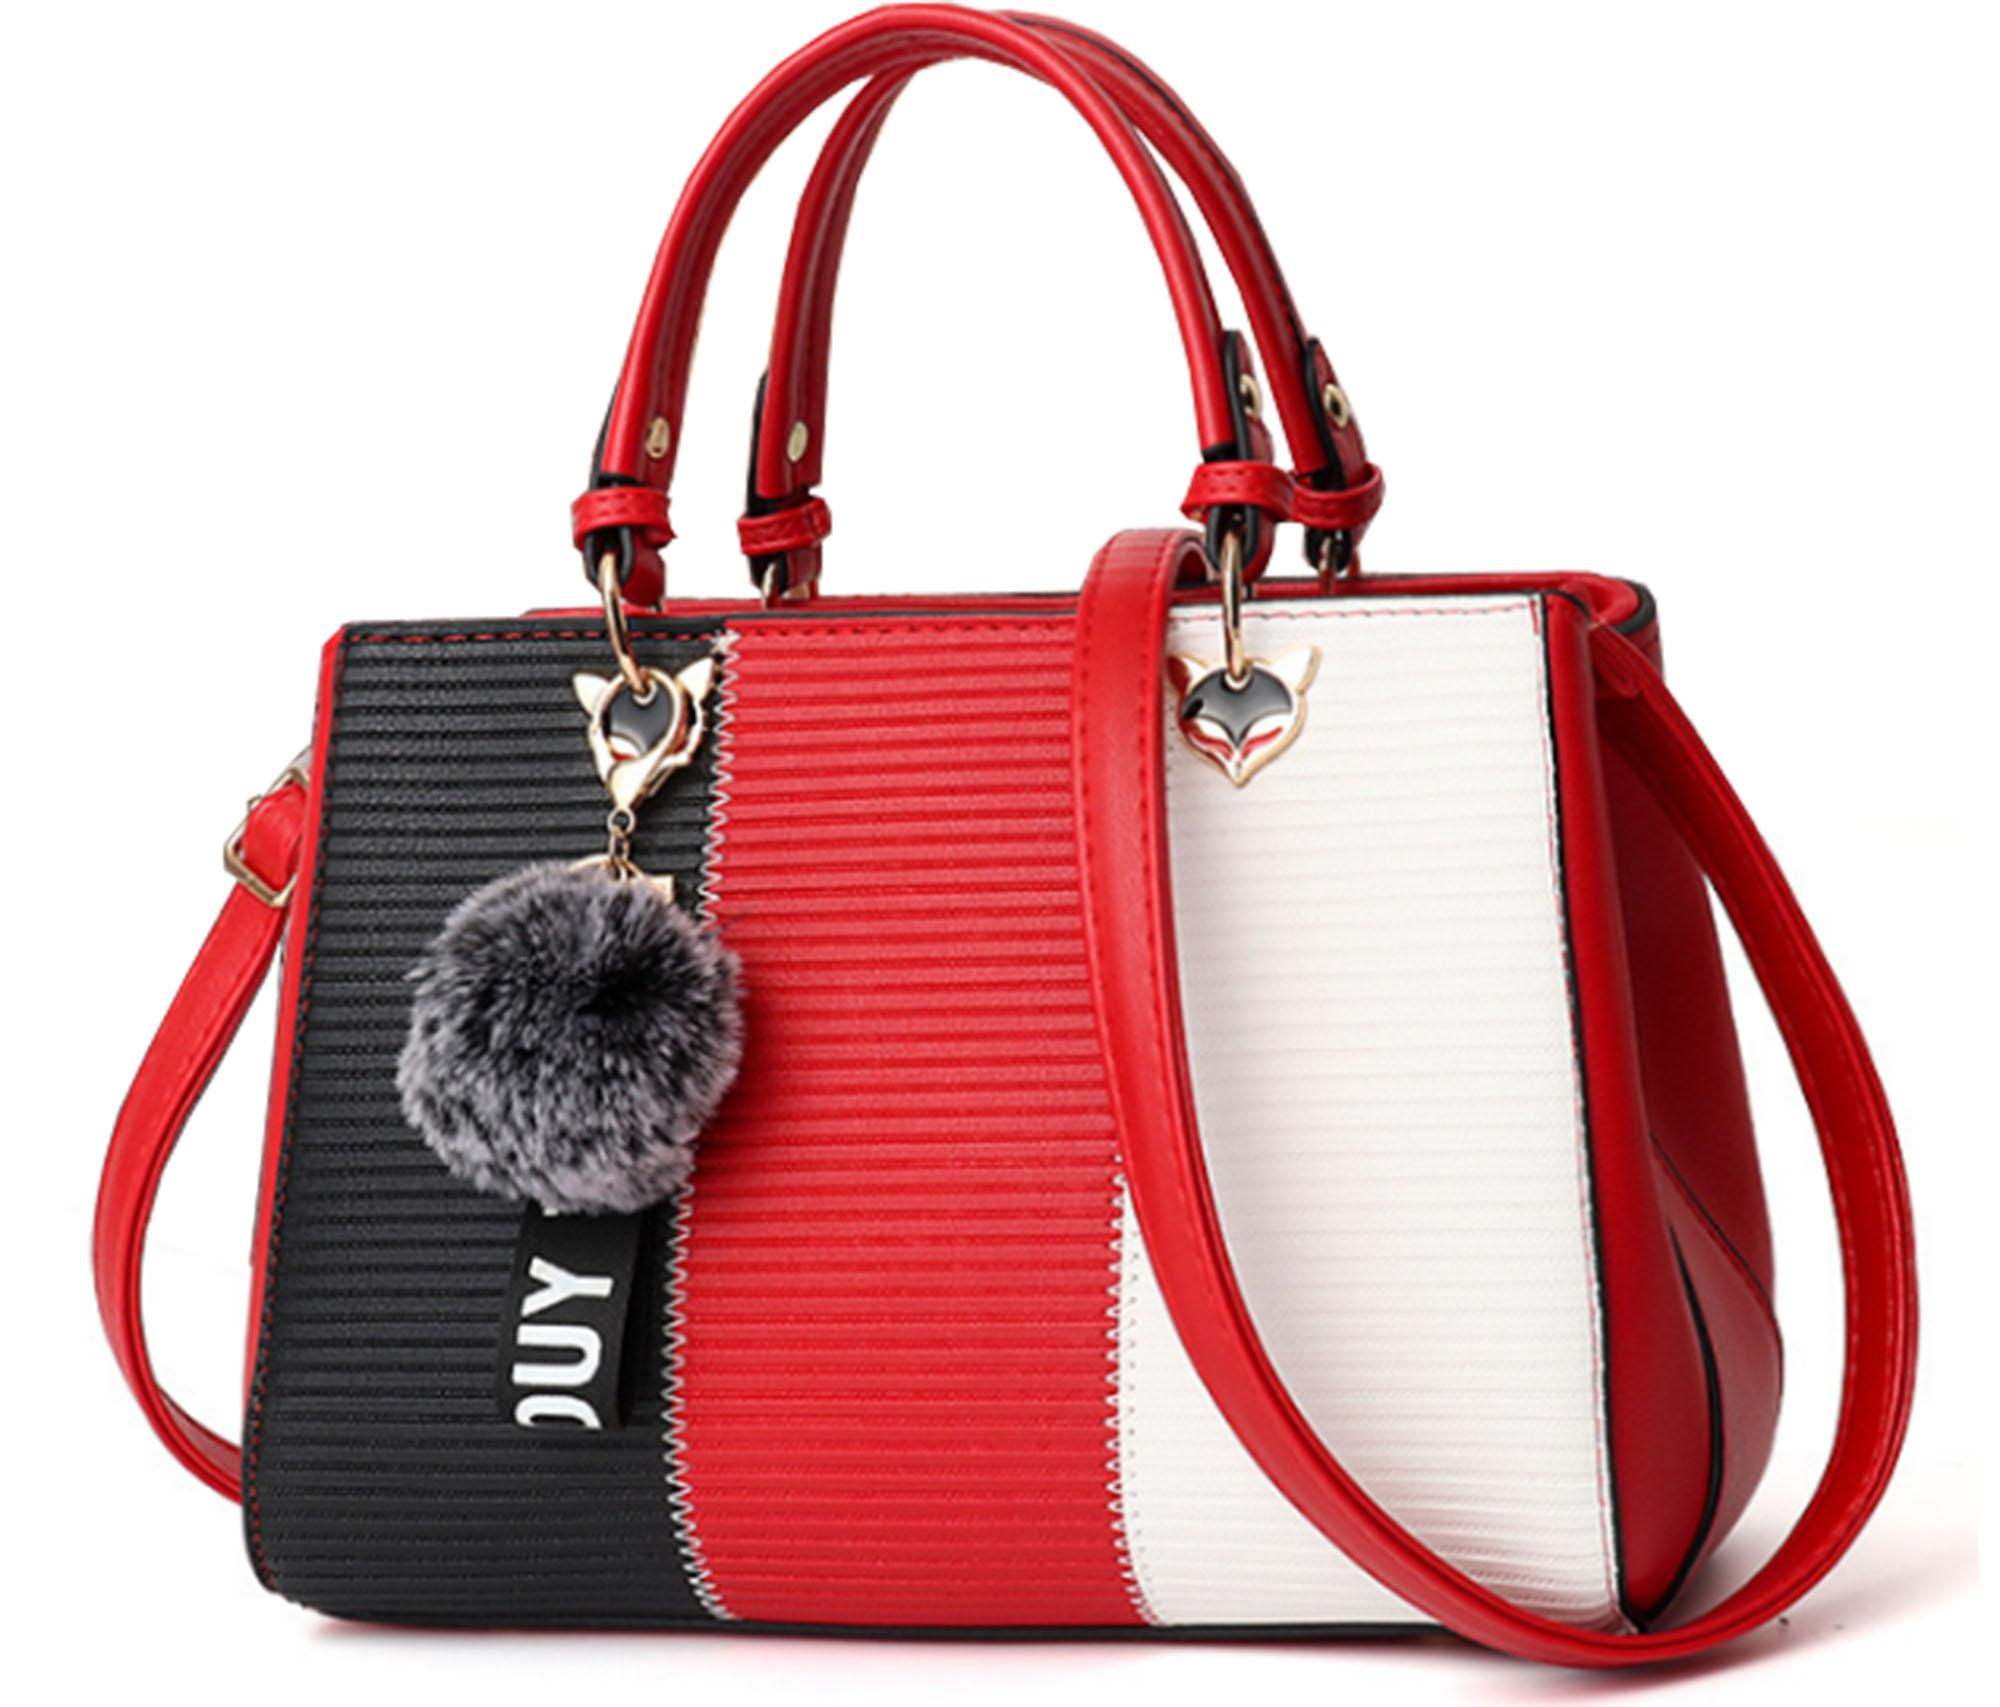 6cf4c3b7f8 Women Hand Bags - Black+Maroon+White - CHOK0514